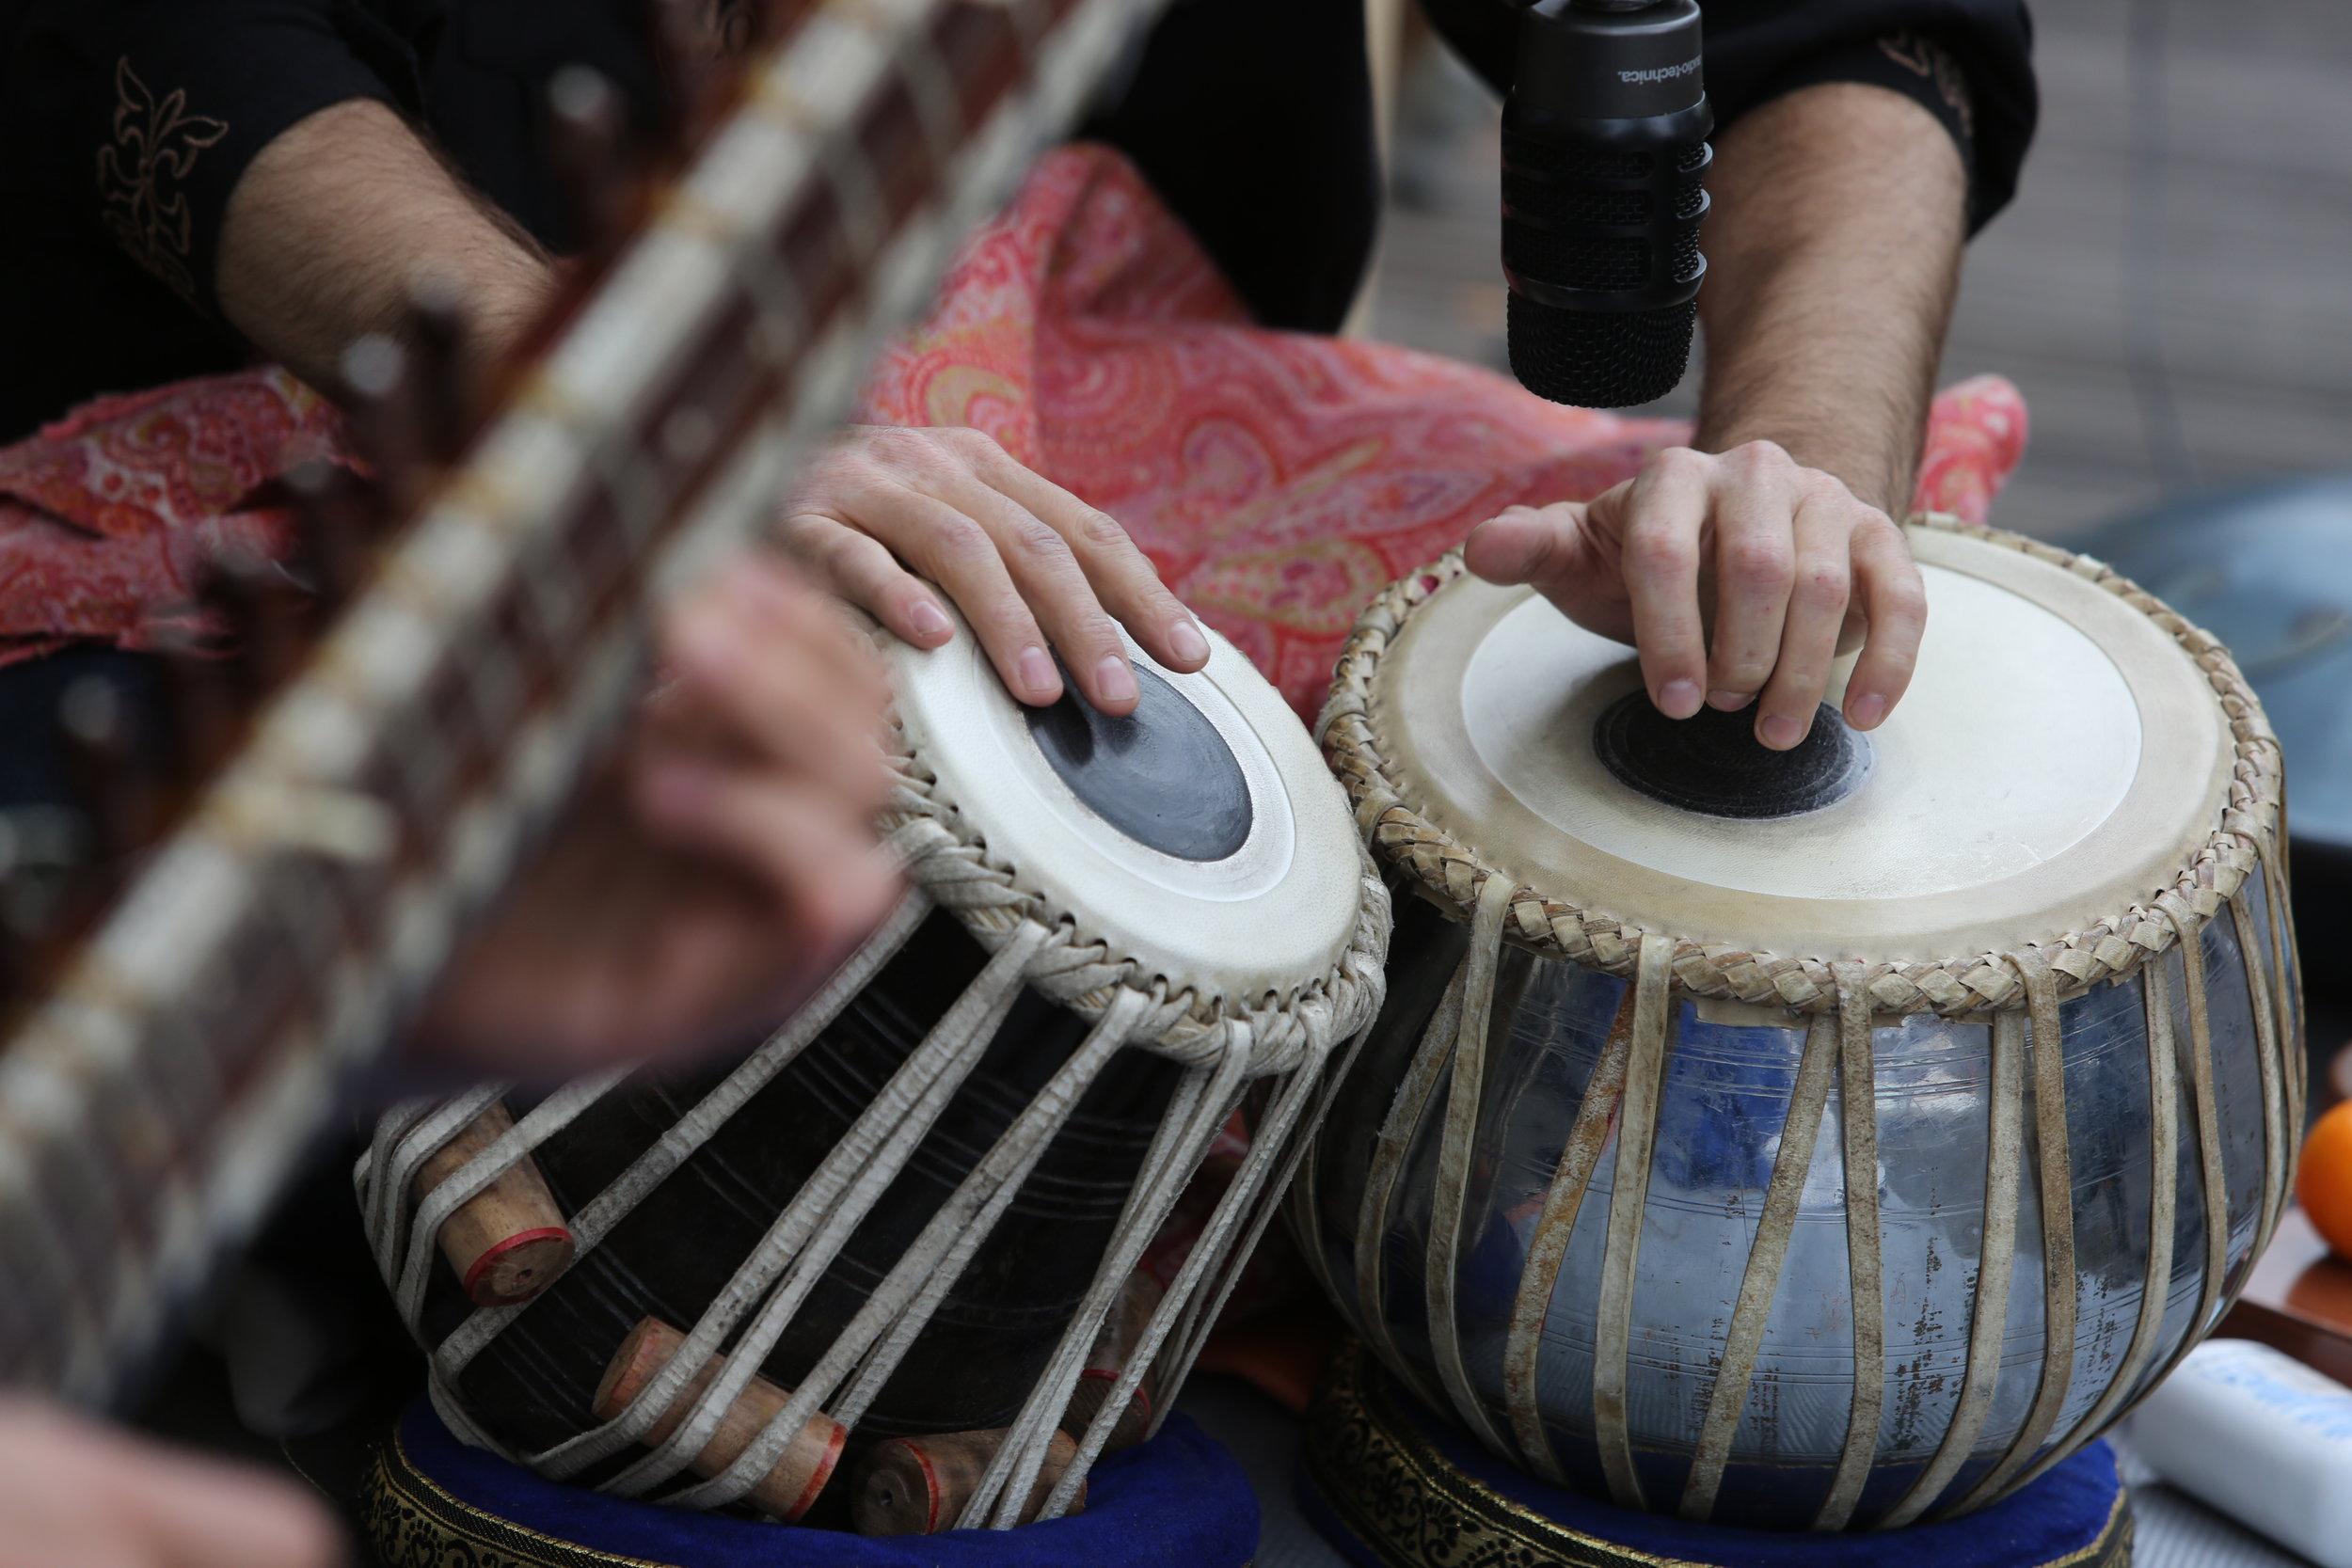 LIVE MUSIC PERFORMANCES    Denis Kucherov and the Samhey Band